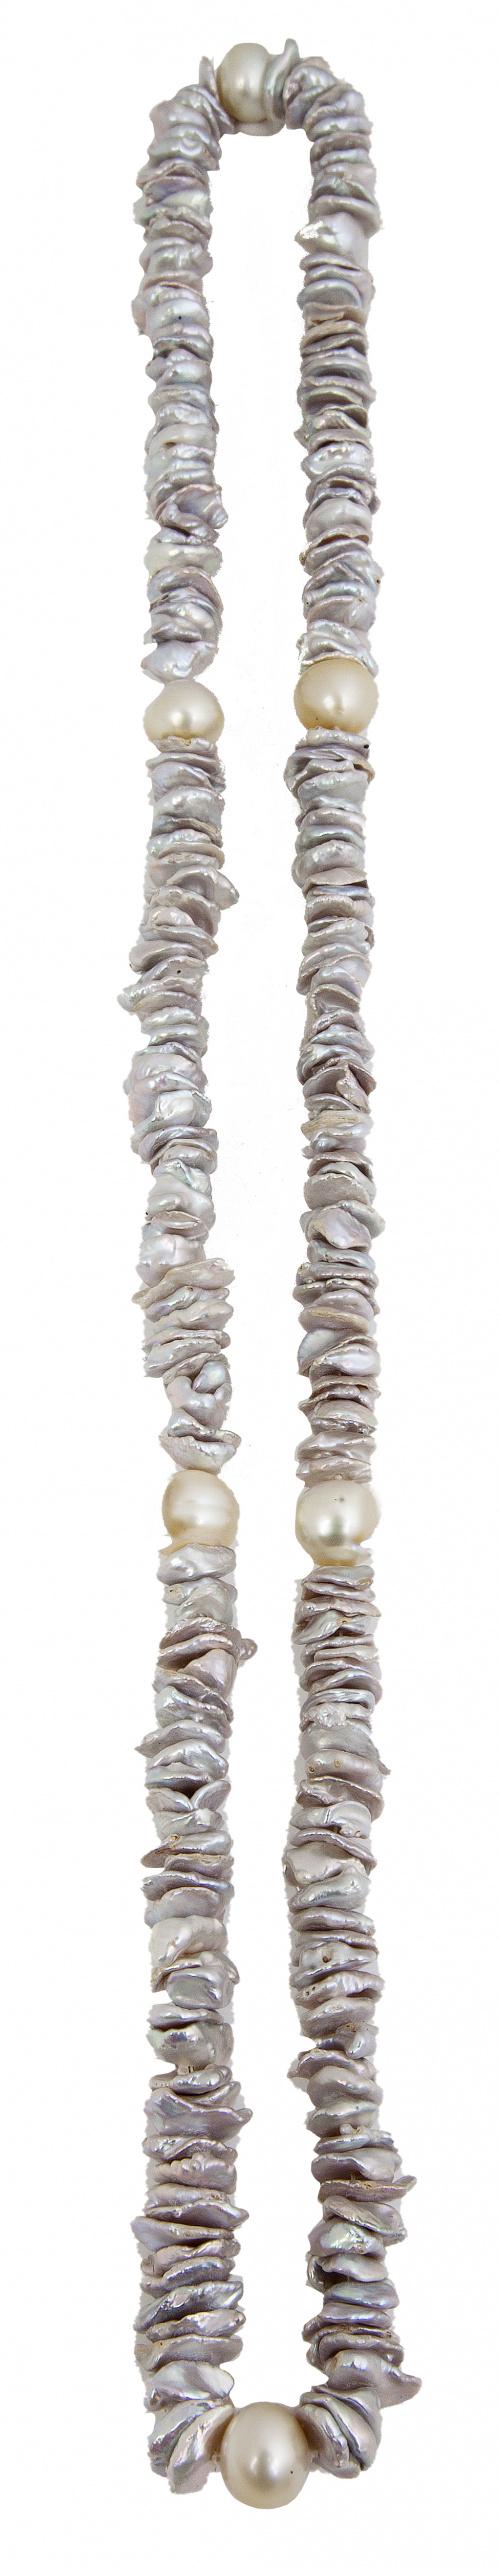 Collar deperlas grises australianas Keshi color gris altern